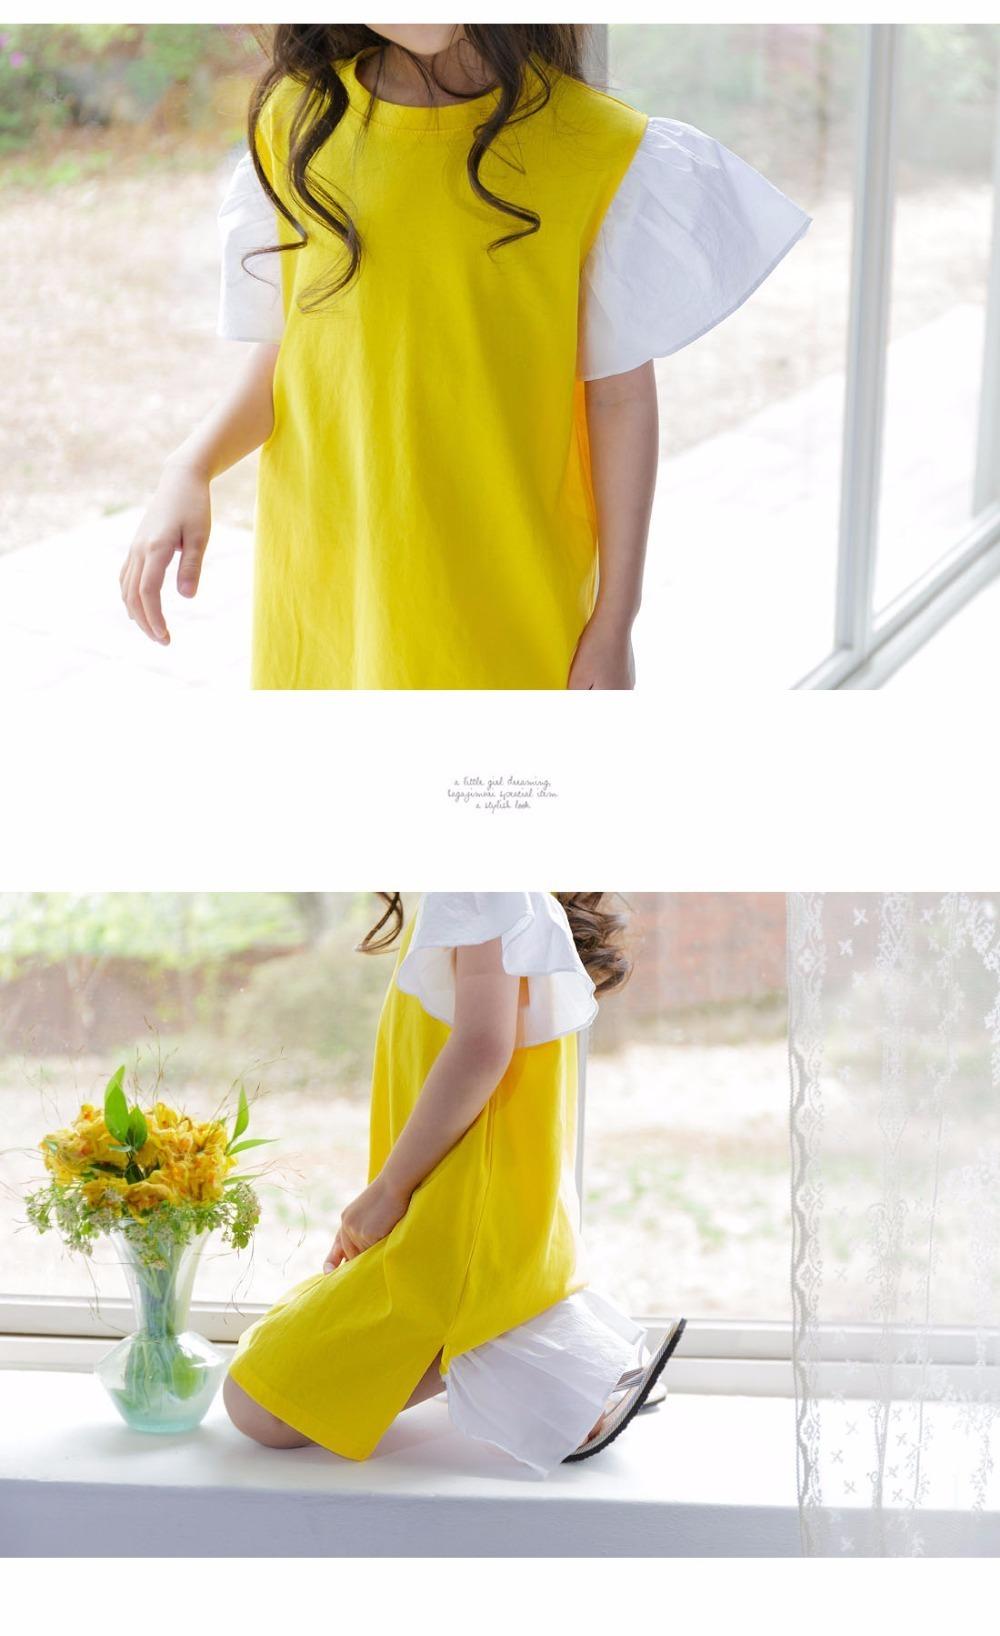 ruffles patchwork little big girl dresses cotton summer 2017 yellow knee legnth kids dresses designs Children Boutique Clothes 4 5 6 7 8 9 10 11 12 13 14 years old little big teenage girls dresses summer dress girl kids 2017 (10)